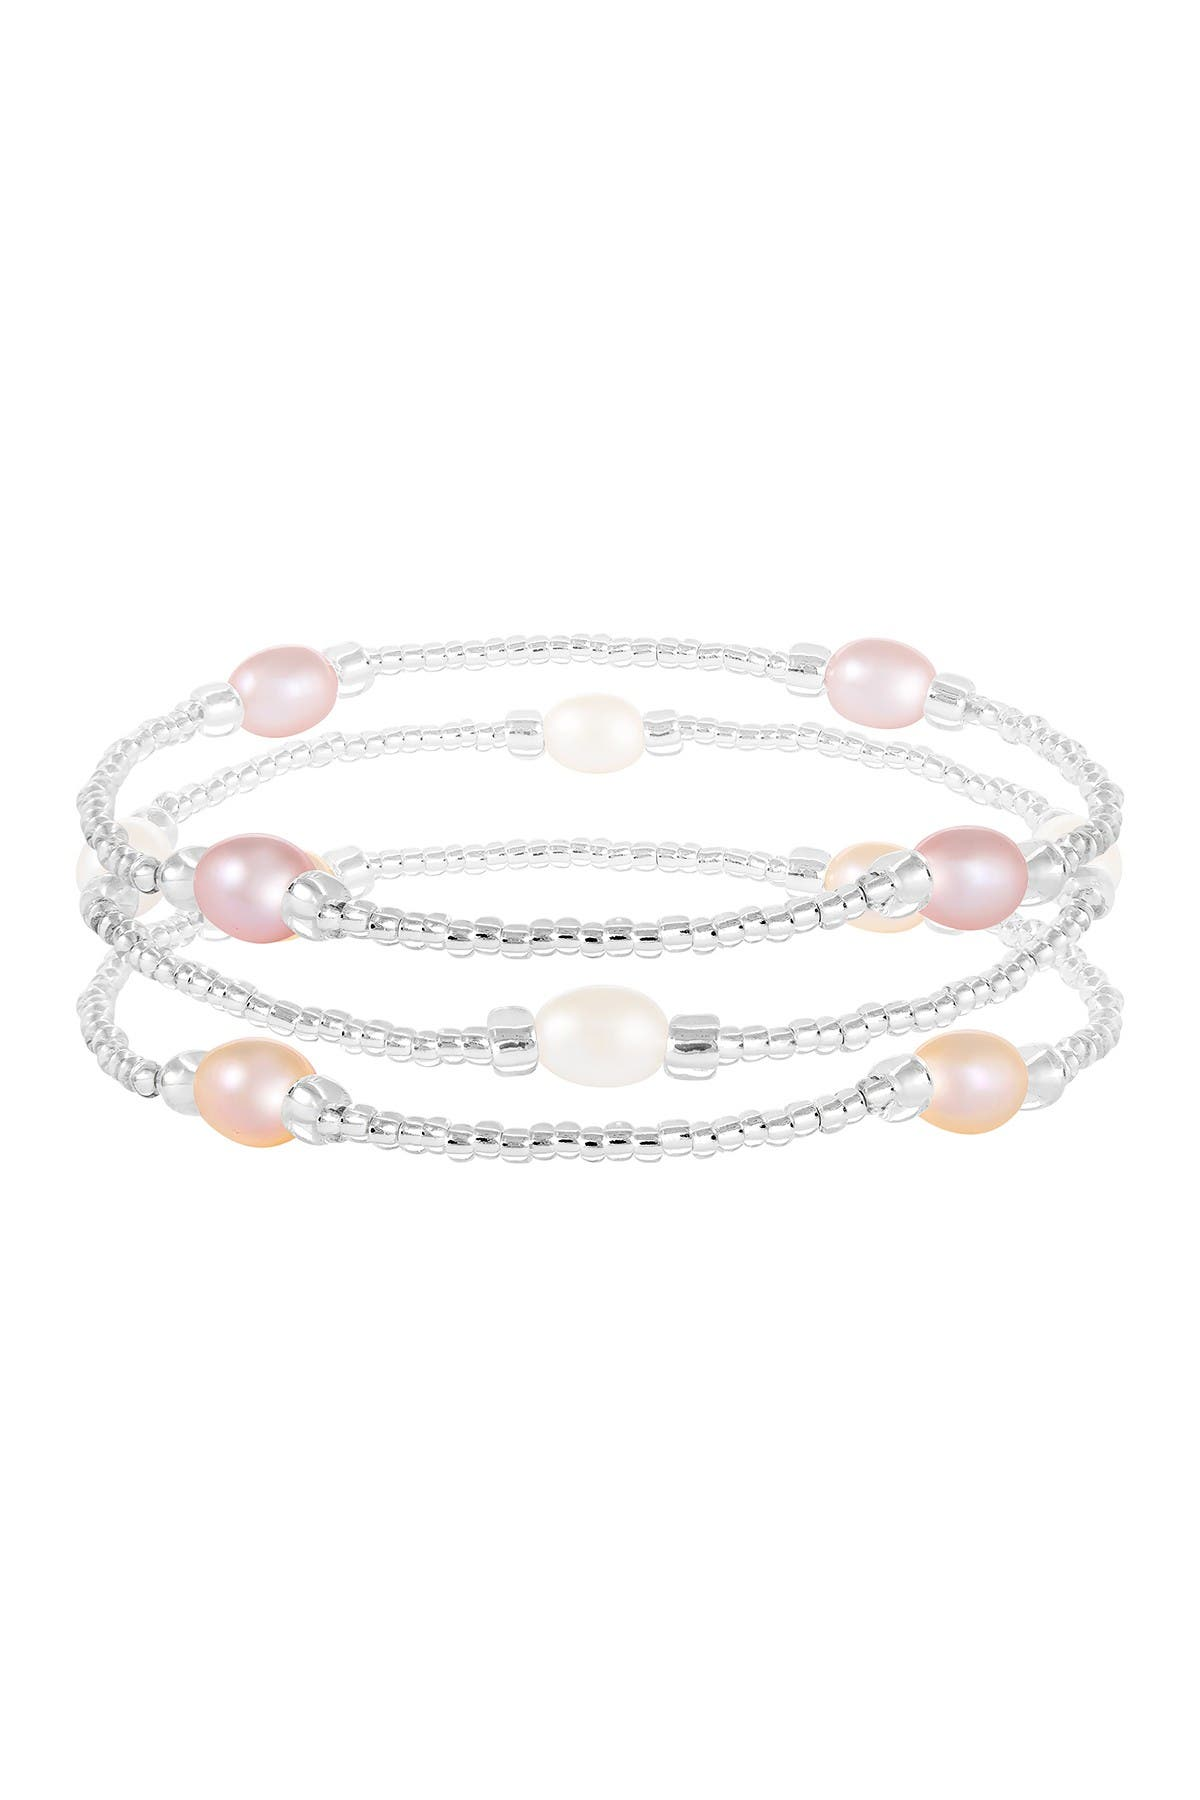 Image of Splendid Pearls Multicolor Cultured Freshwater Pearl Beaded Bracelet - Set of 3